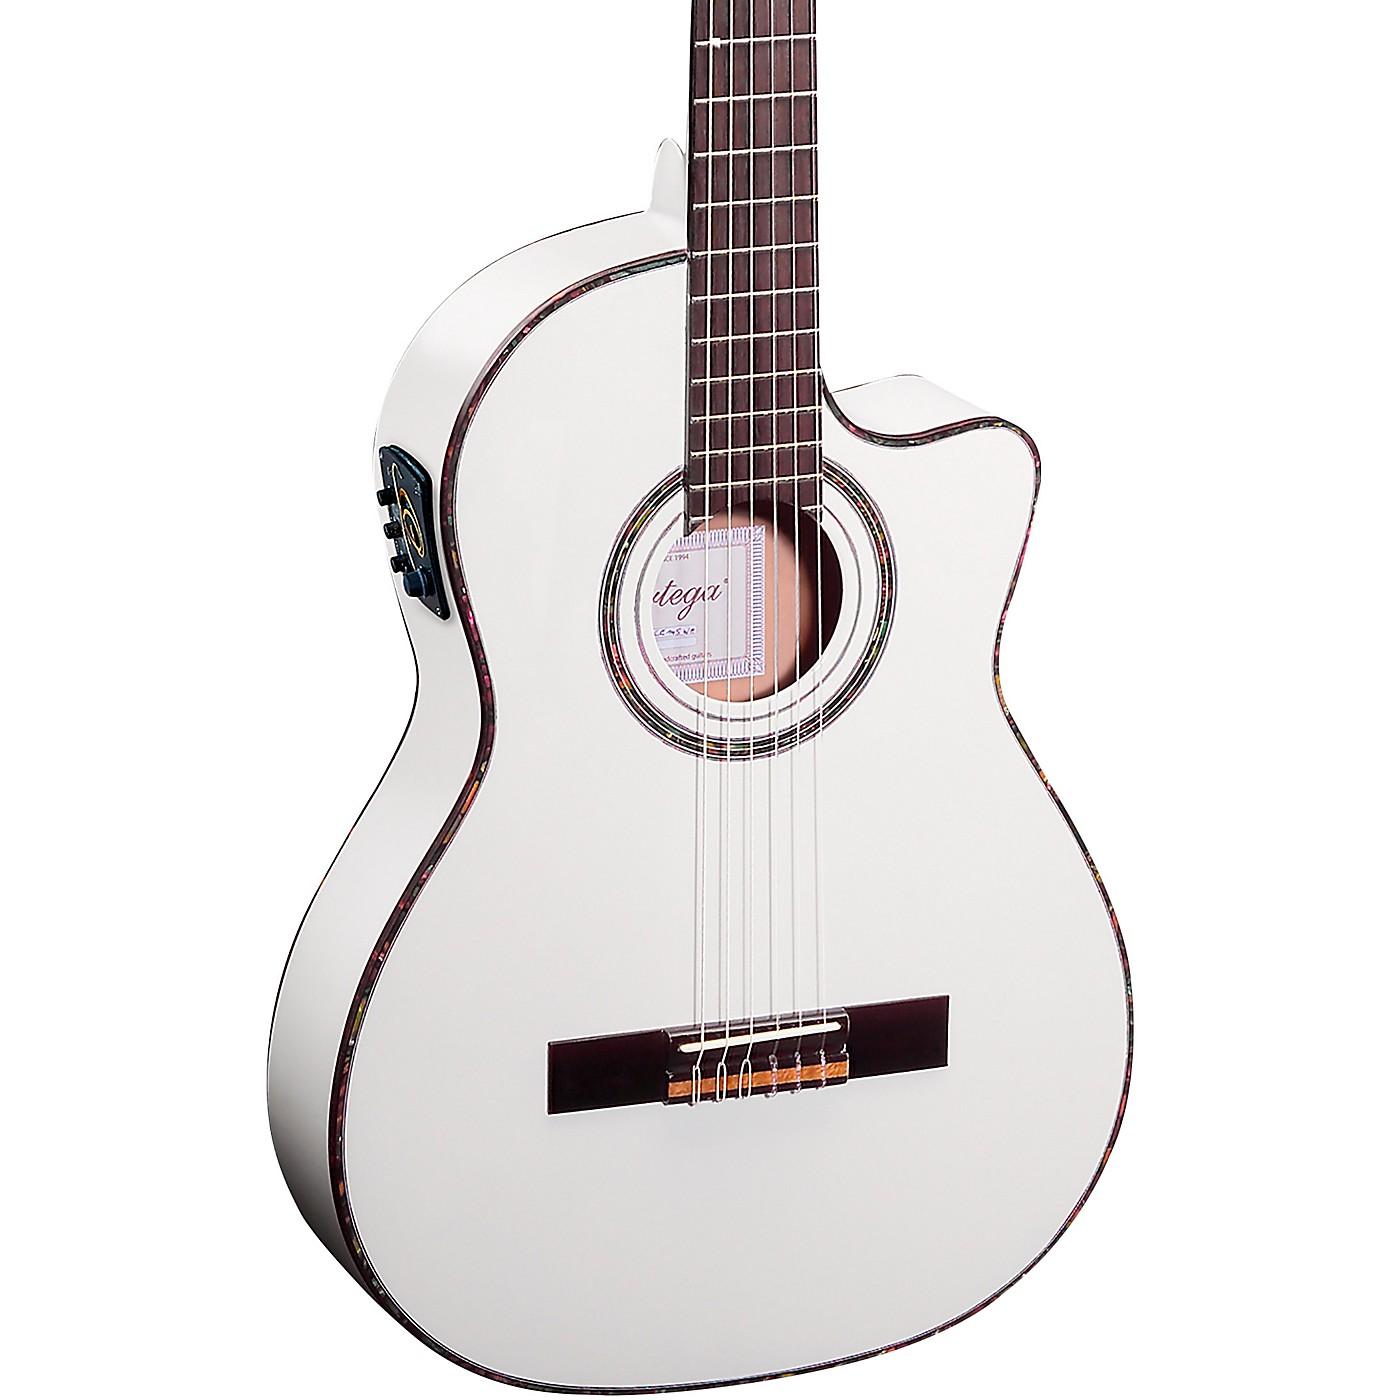 Ortega Family Series Pro RCE145WH Thinline Acoustic Electric Nylon Guitar thumbnail